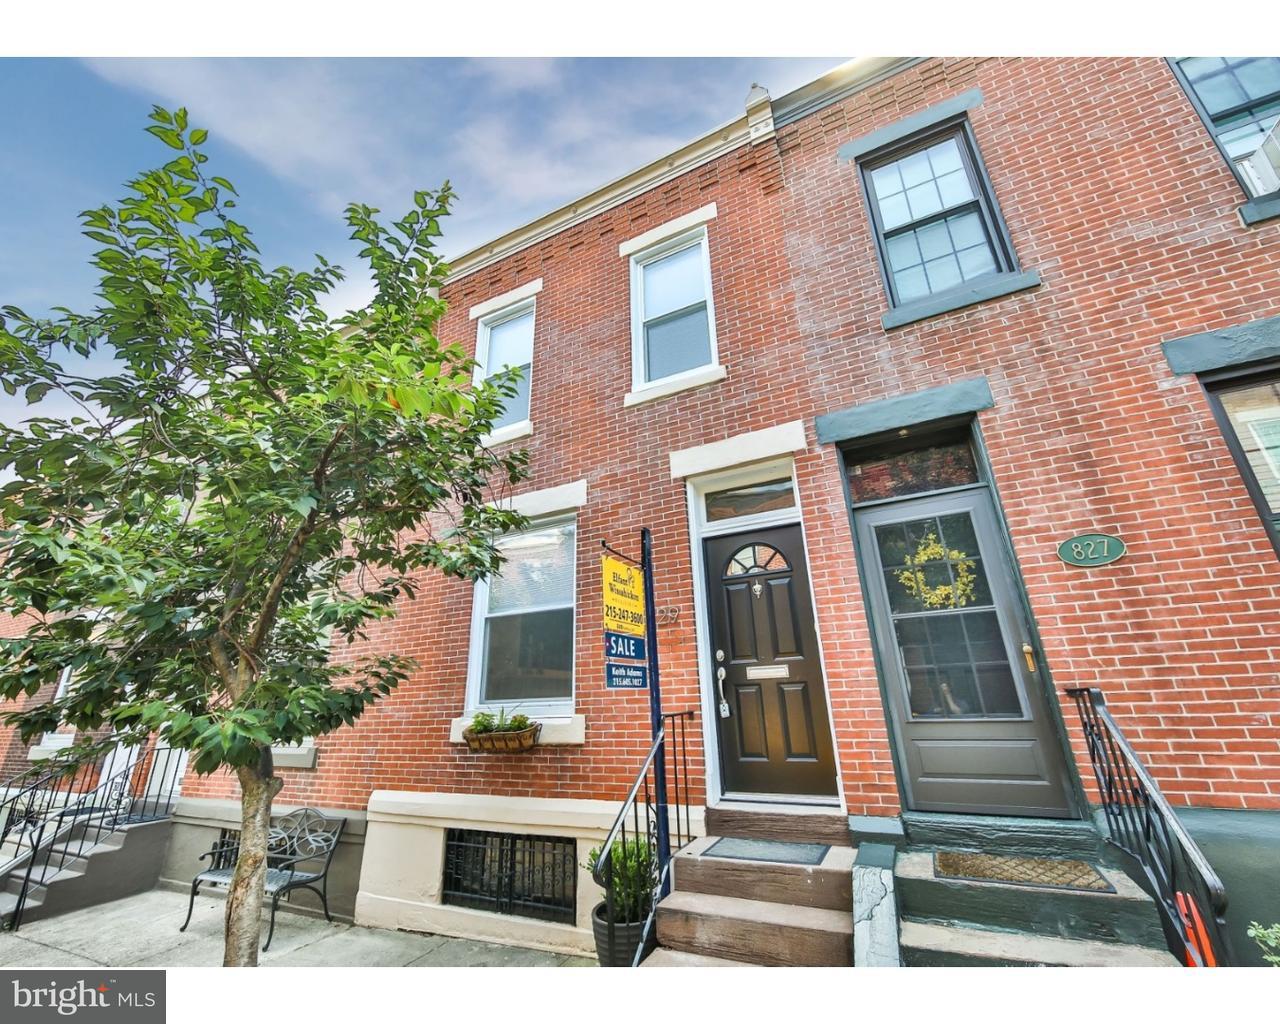 829 N. Taylor St Philadelphia, PA 19130